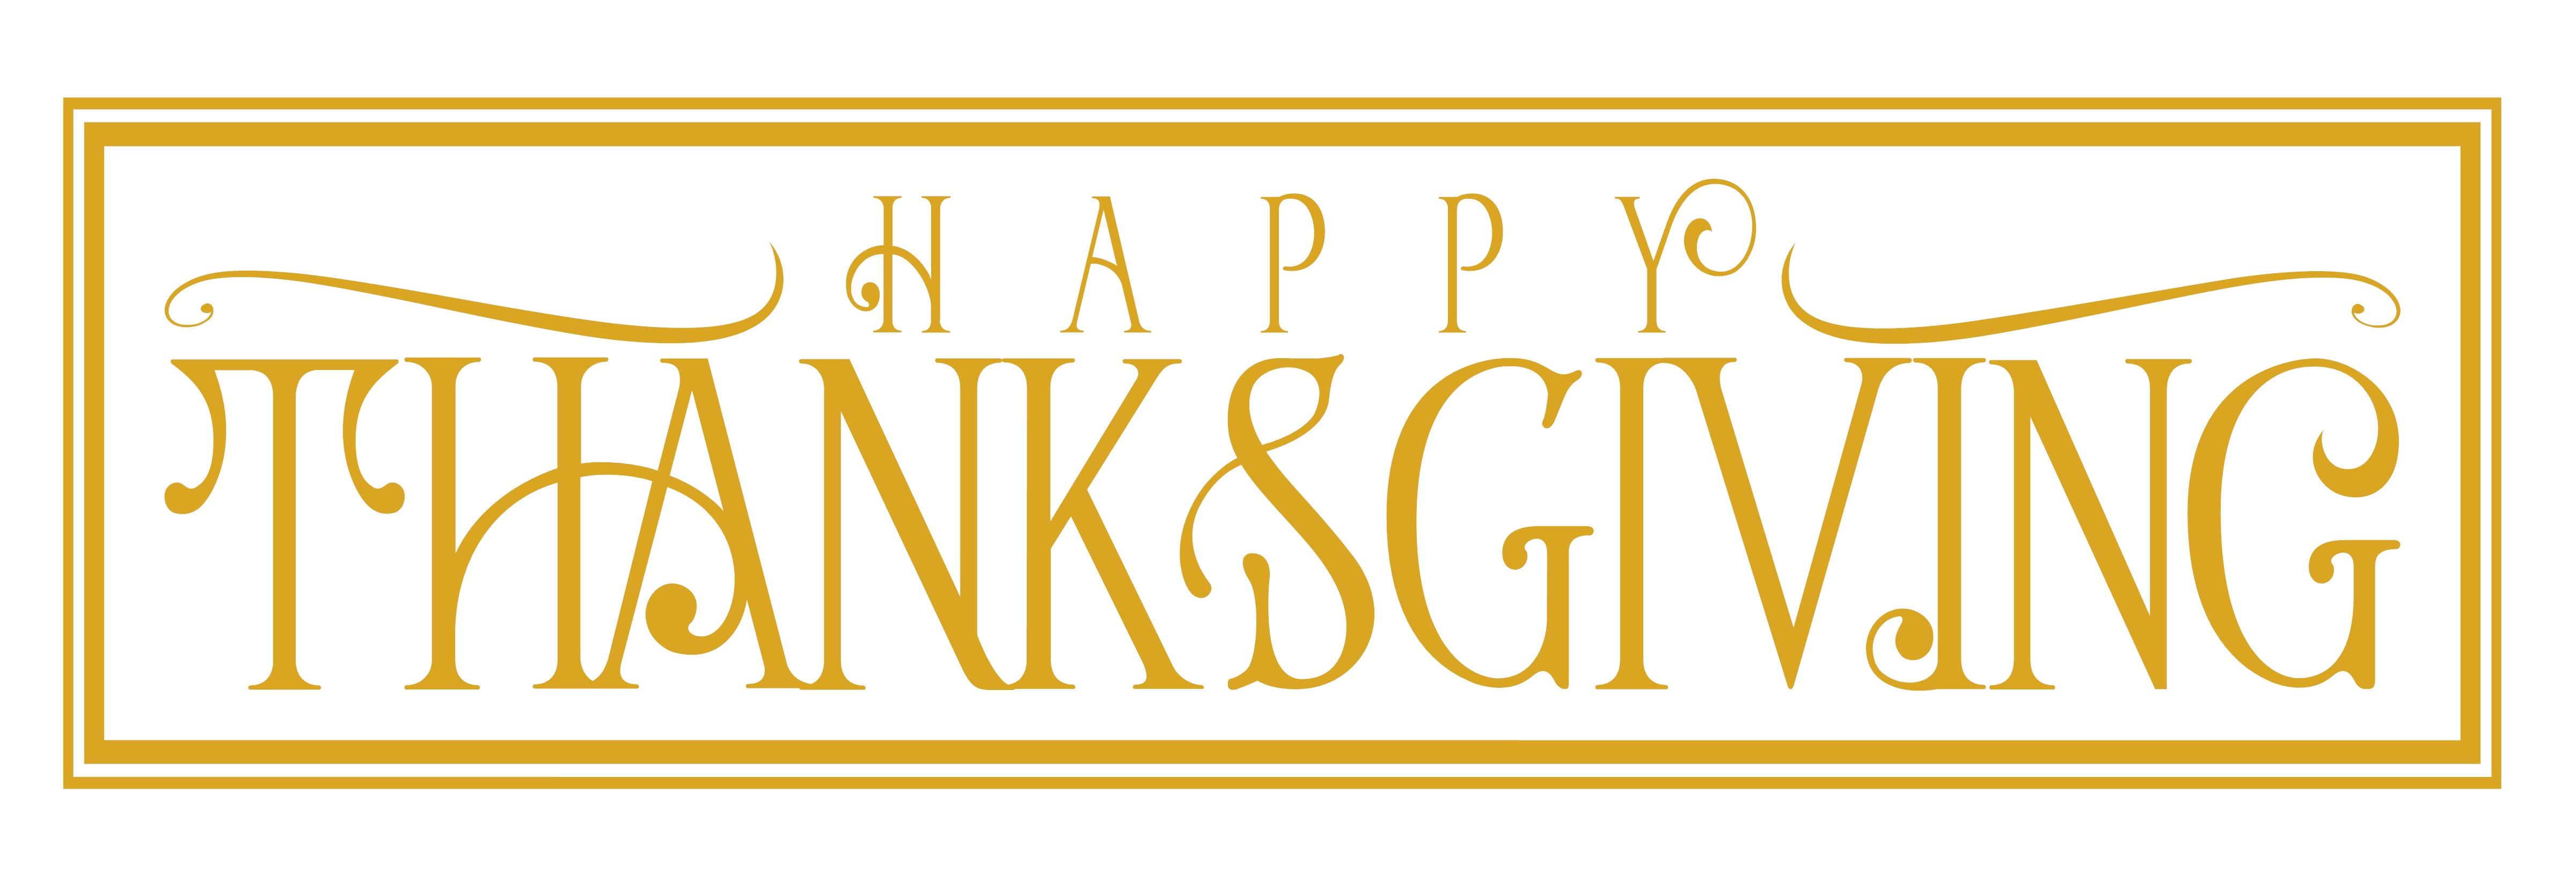 CB-Happy Thanksgiving